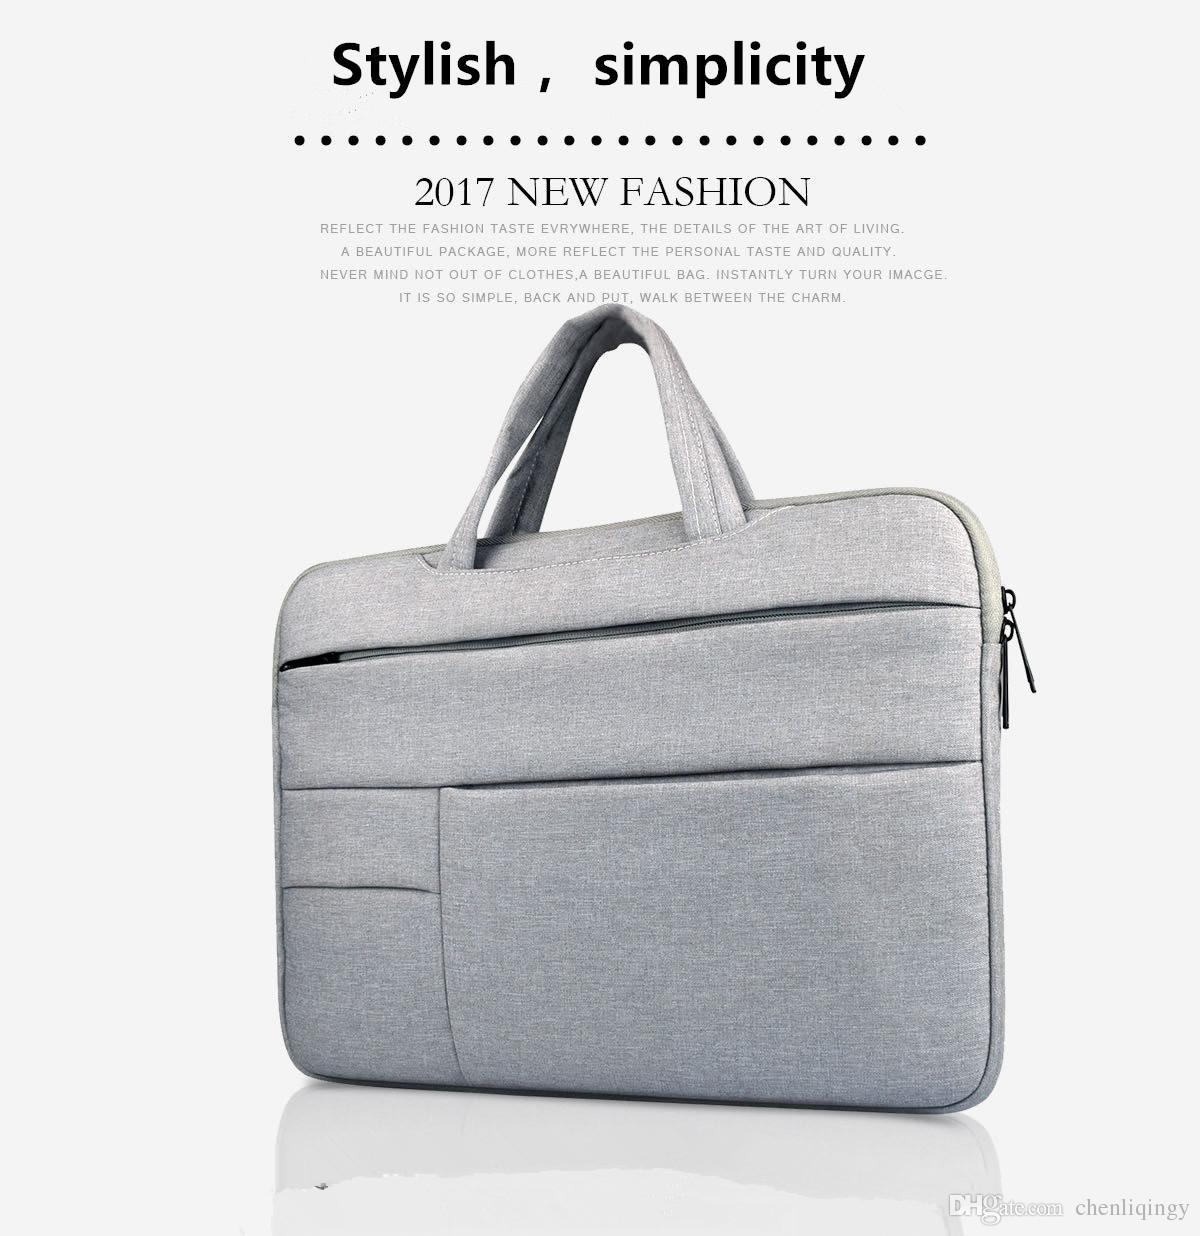 Hot Top Laptop portátil Sleeve Sleeve Case Notebook 11 12 13 14 15 15,6 polegada Capa Mole para Retina Pro 13.3